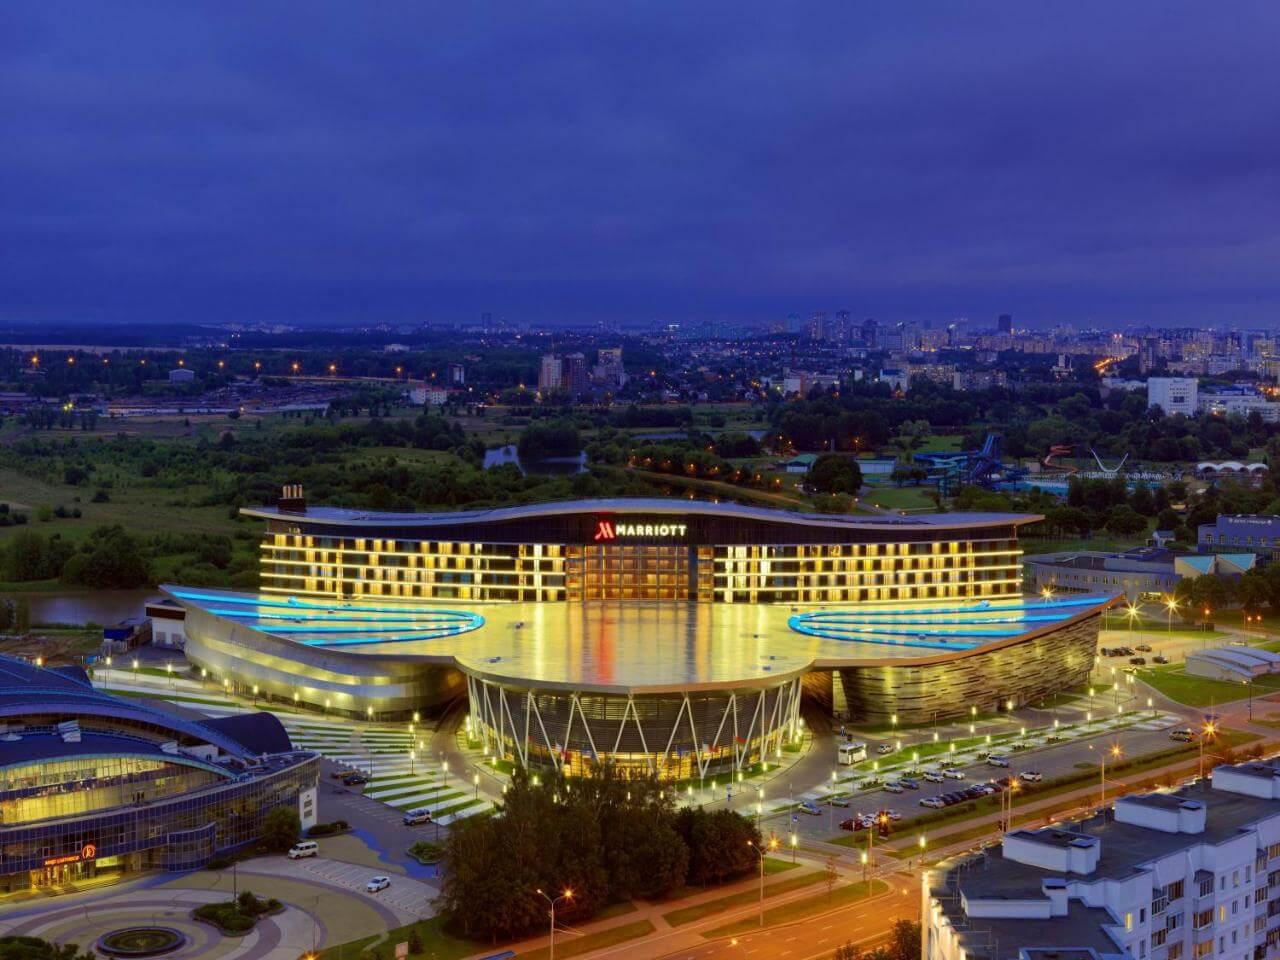 Marriott hotel in Minsk city center night view Belarus